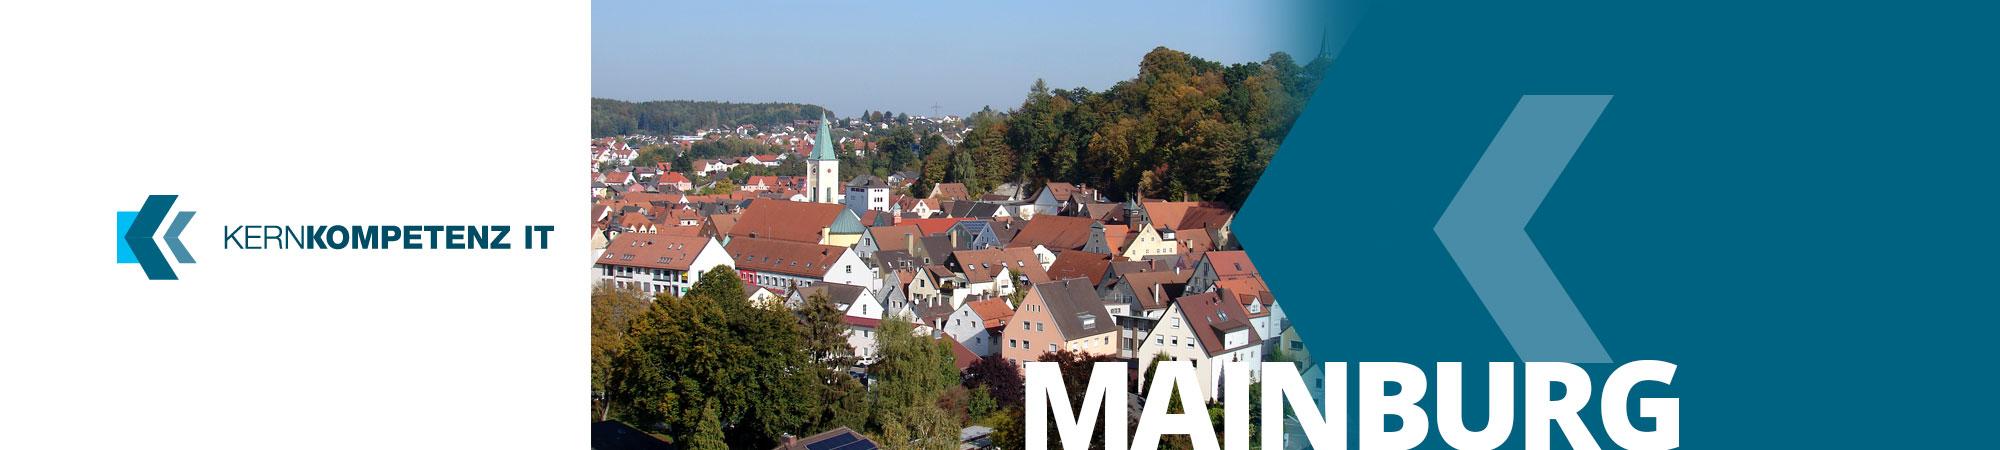 IT Systemhaus Mainburg kompetente EDV Beratung IT Service Mainburg